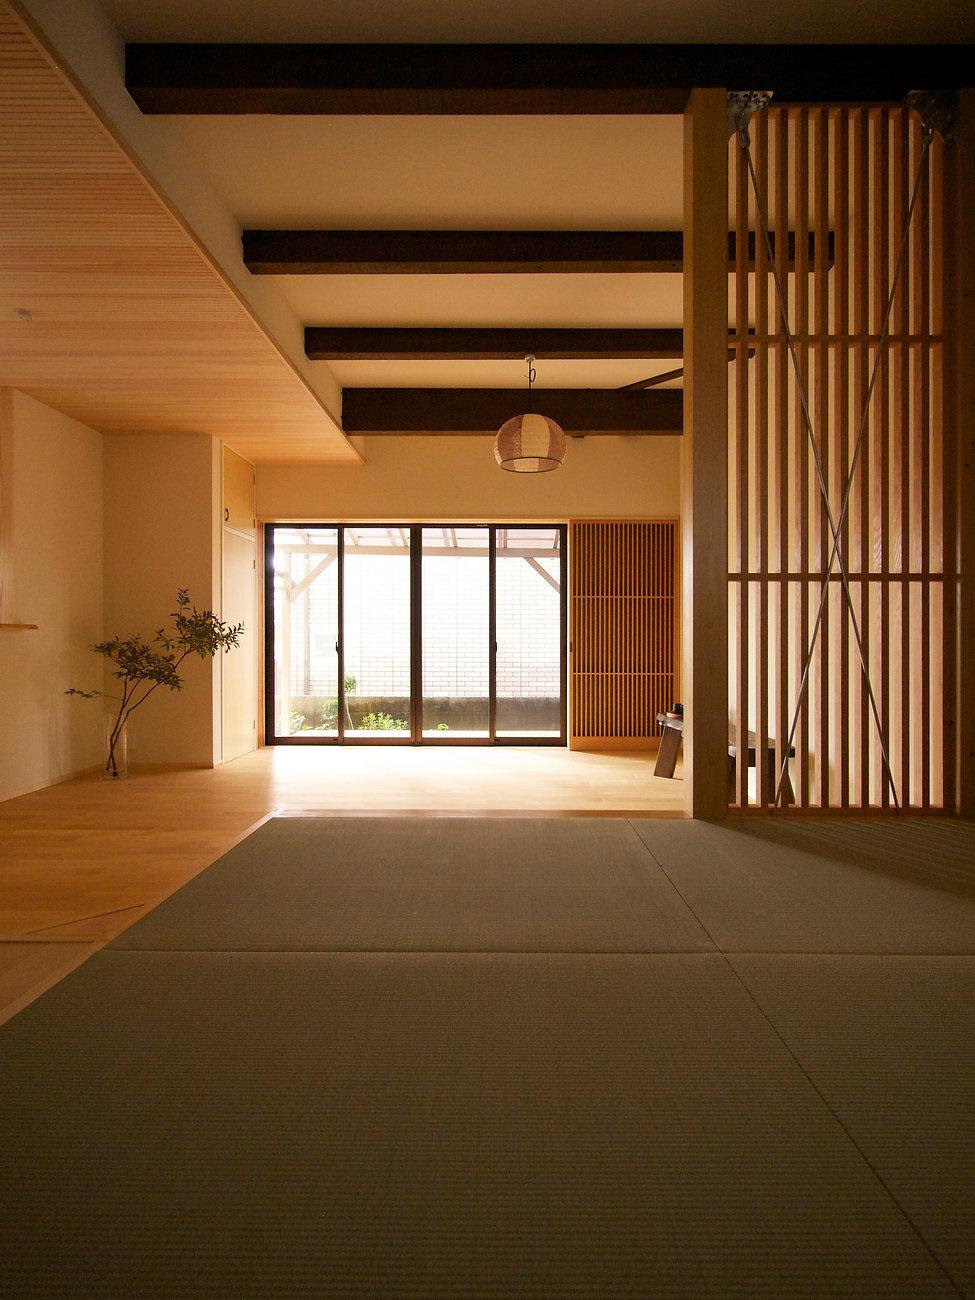 TSUGU DESIGN 和歌山市木ノ本の家リノベーション